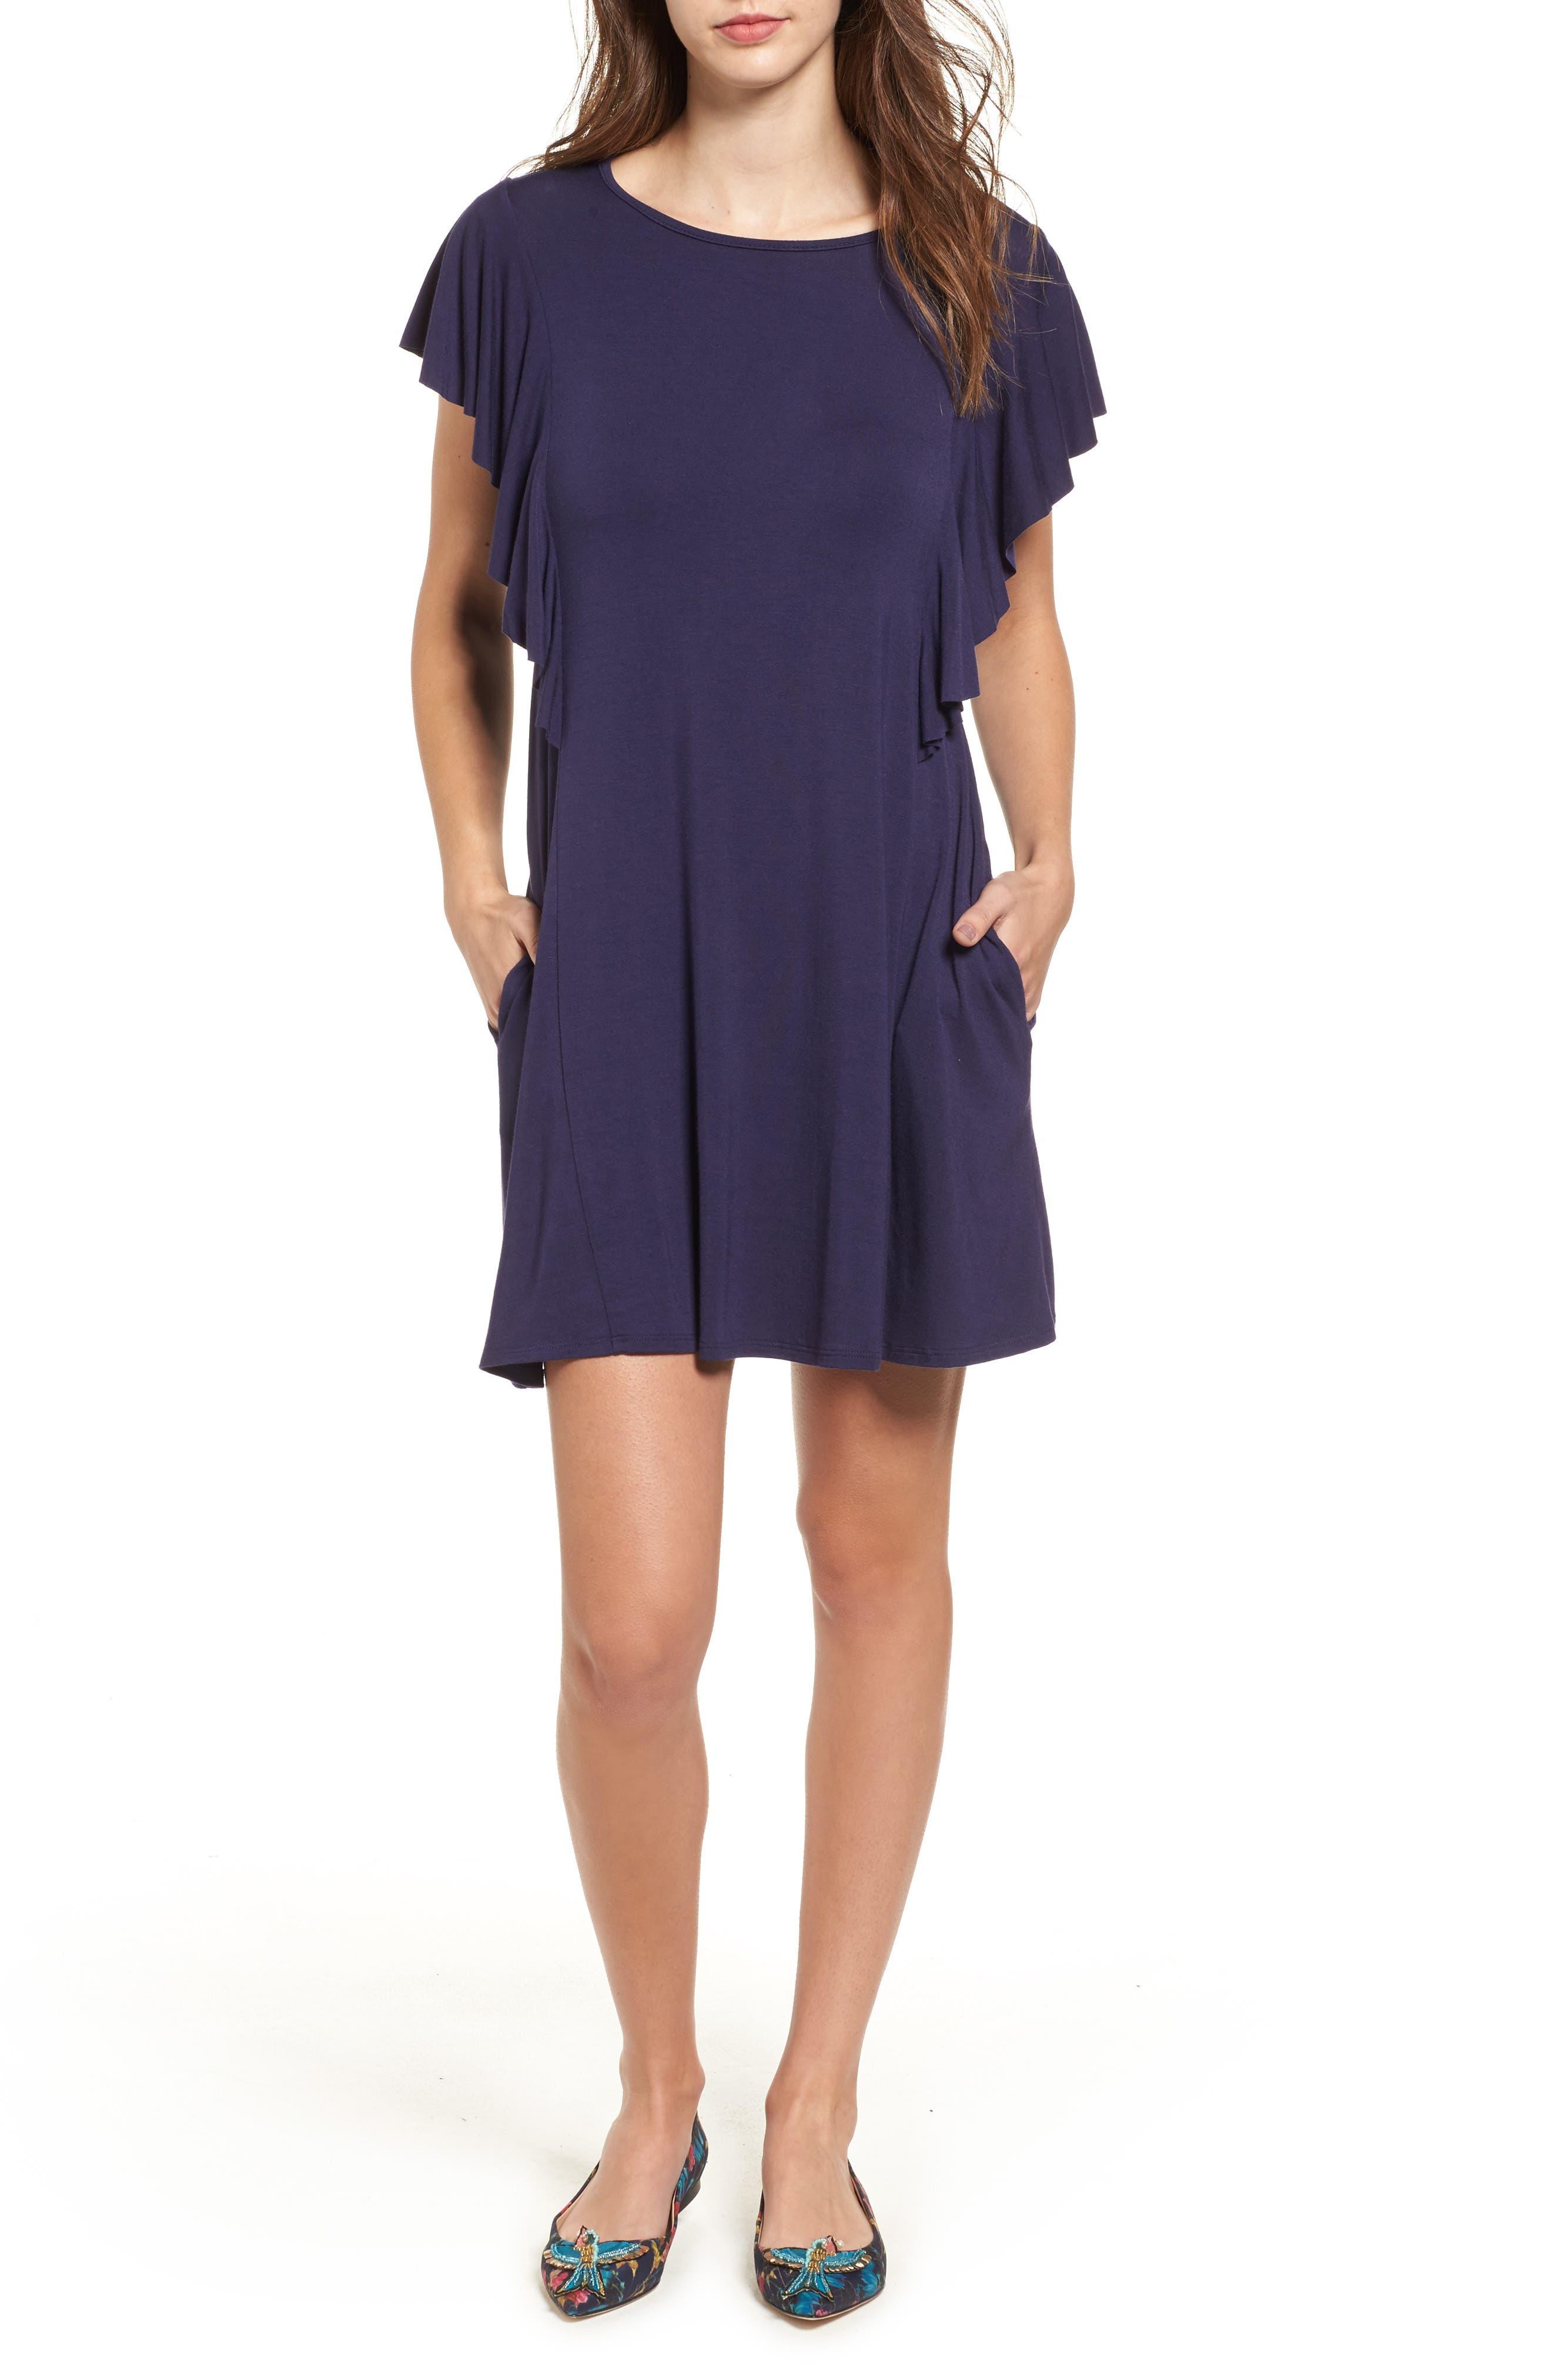 Socialite Ruffle Sleeve T-Shirt Dress